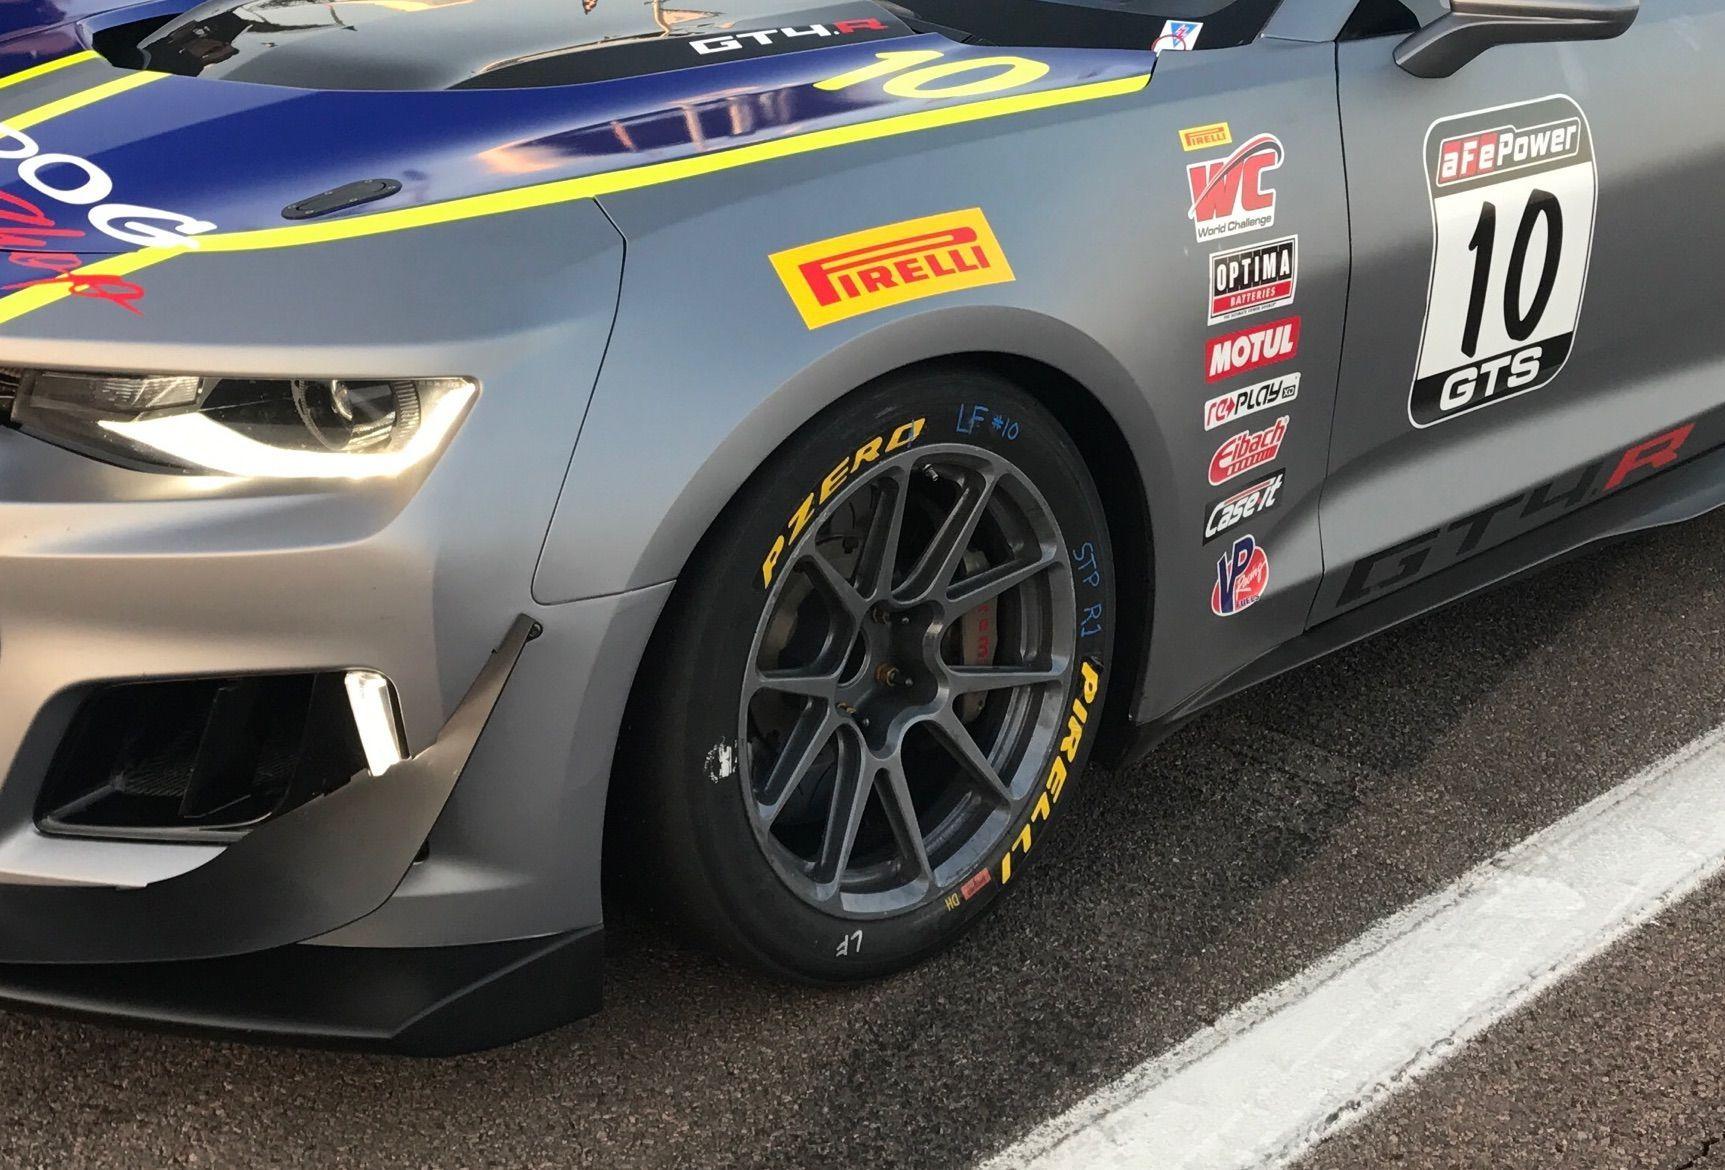 2017 Chevrolet Camaro   Lawson Aschenbach Starts the 2017 Pirelli World Challenge Season From the Pole in the New Chevrolet Camaro GT4.R on Forgeline One Piece Forged Monoblock GS1R Wheels!